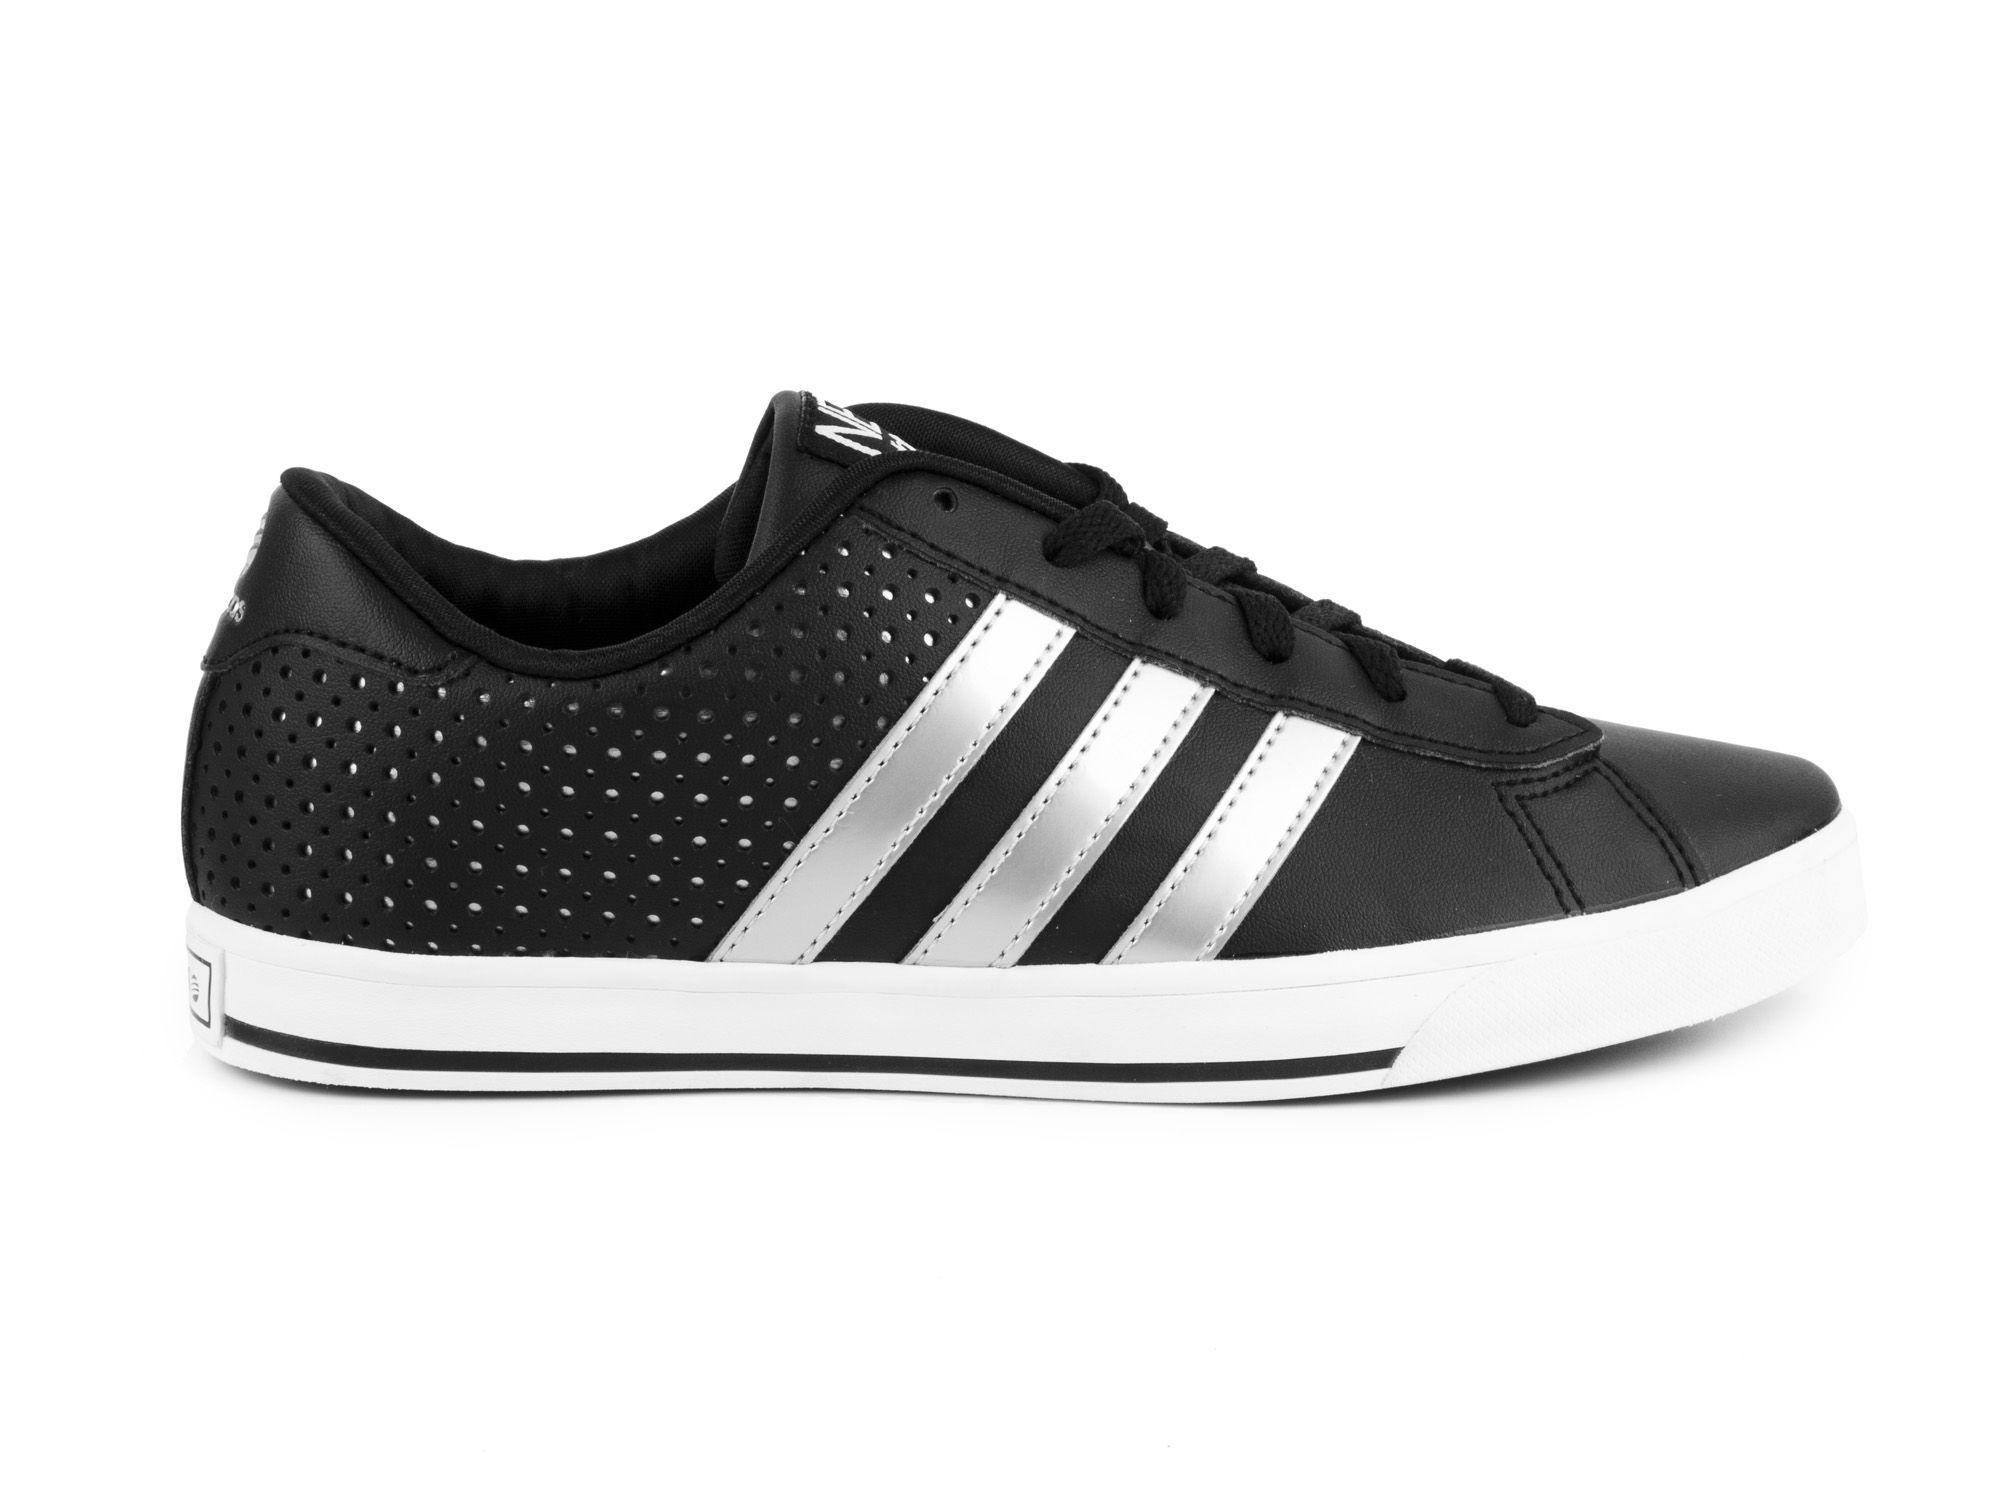 Adidas Neo - Tenisky Se Daily Qt Lo W Q26251   černo-stříbrná ... d3c5f553b7